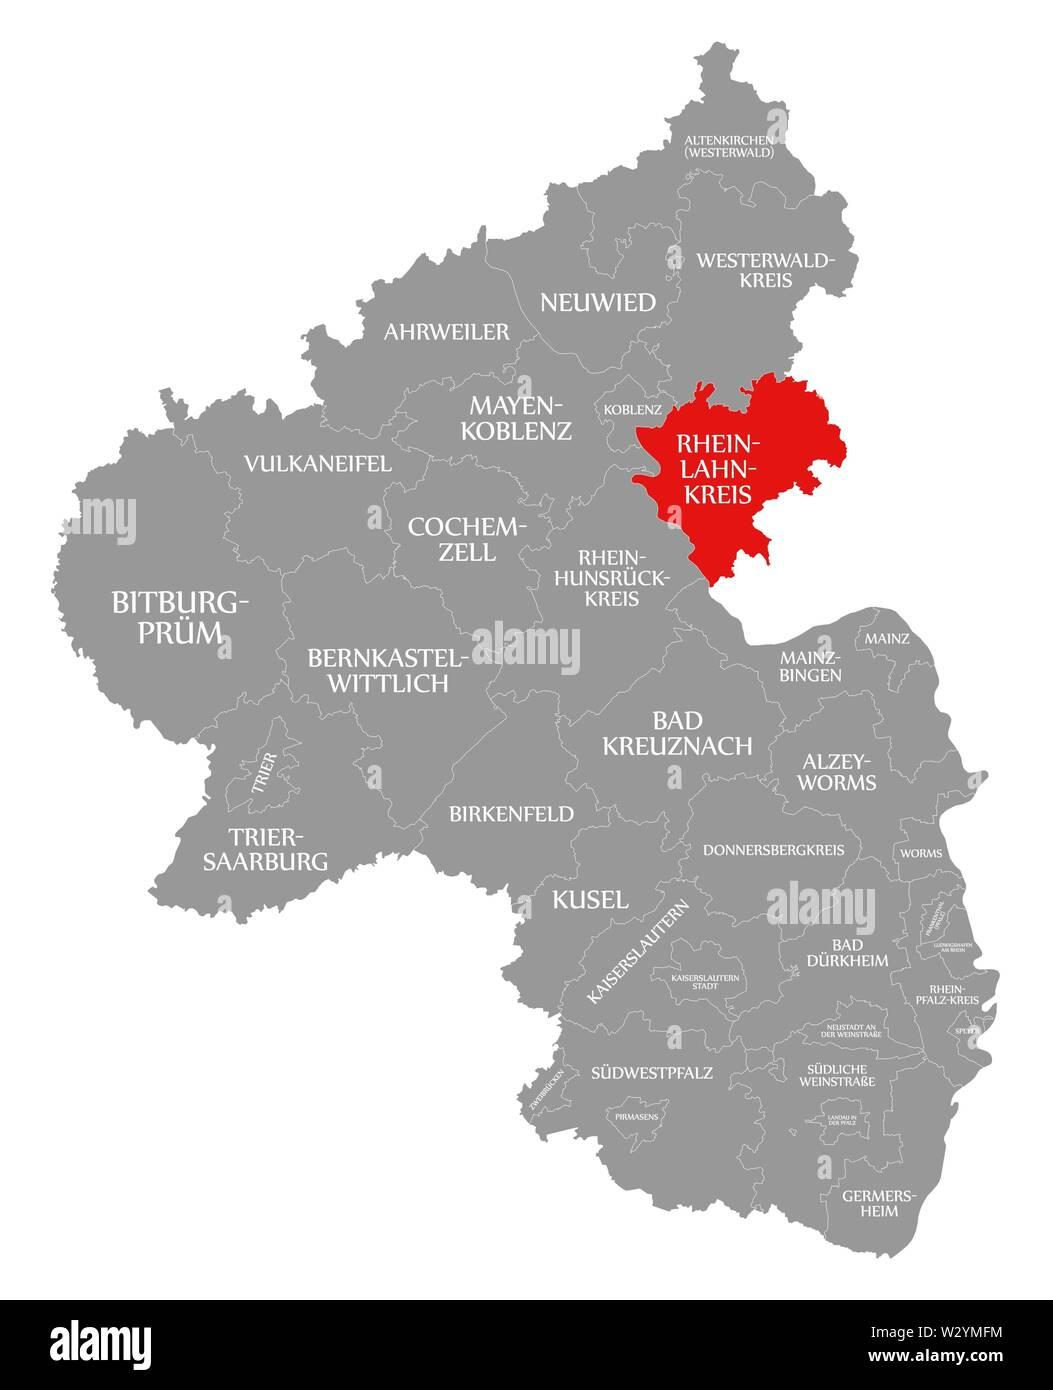 Rhein Lahn Kreis red highlighted in map of Rhineland Palatinate DE - Stock Image